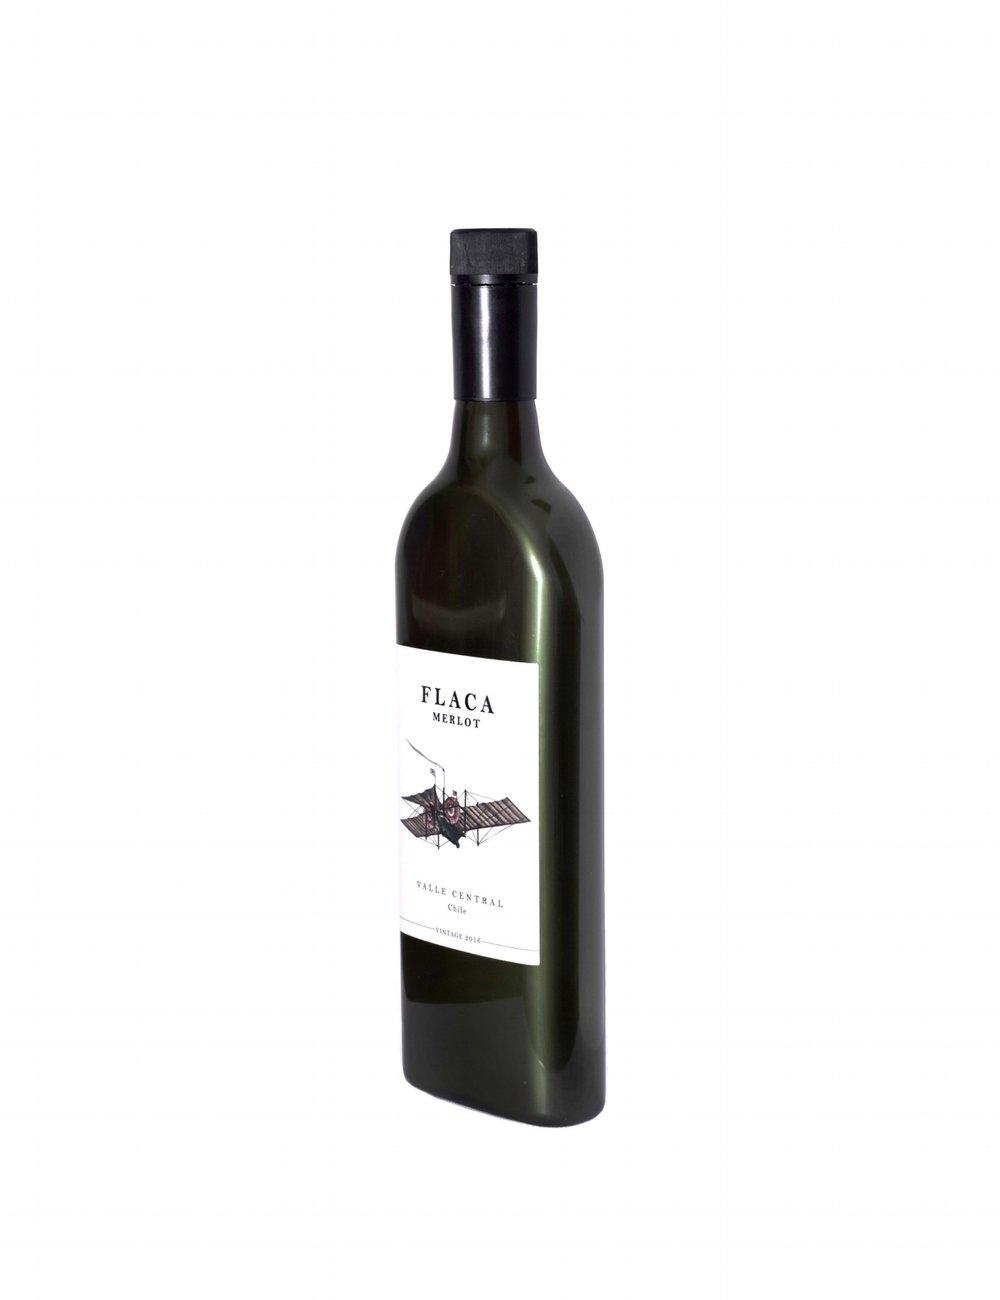 Garçon_Wines_Merlot_Flaca_Chile_angle.jpg